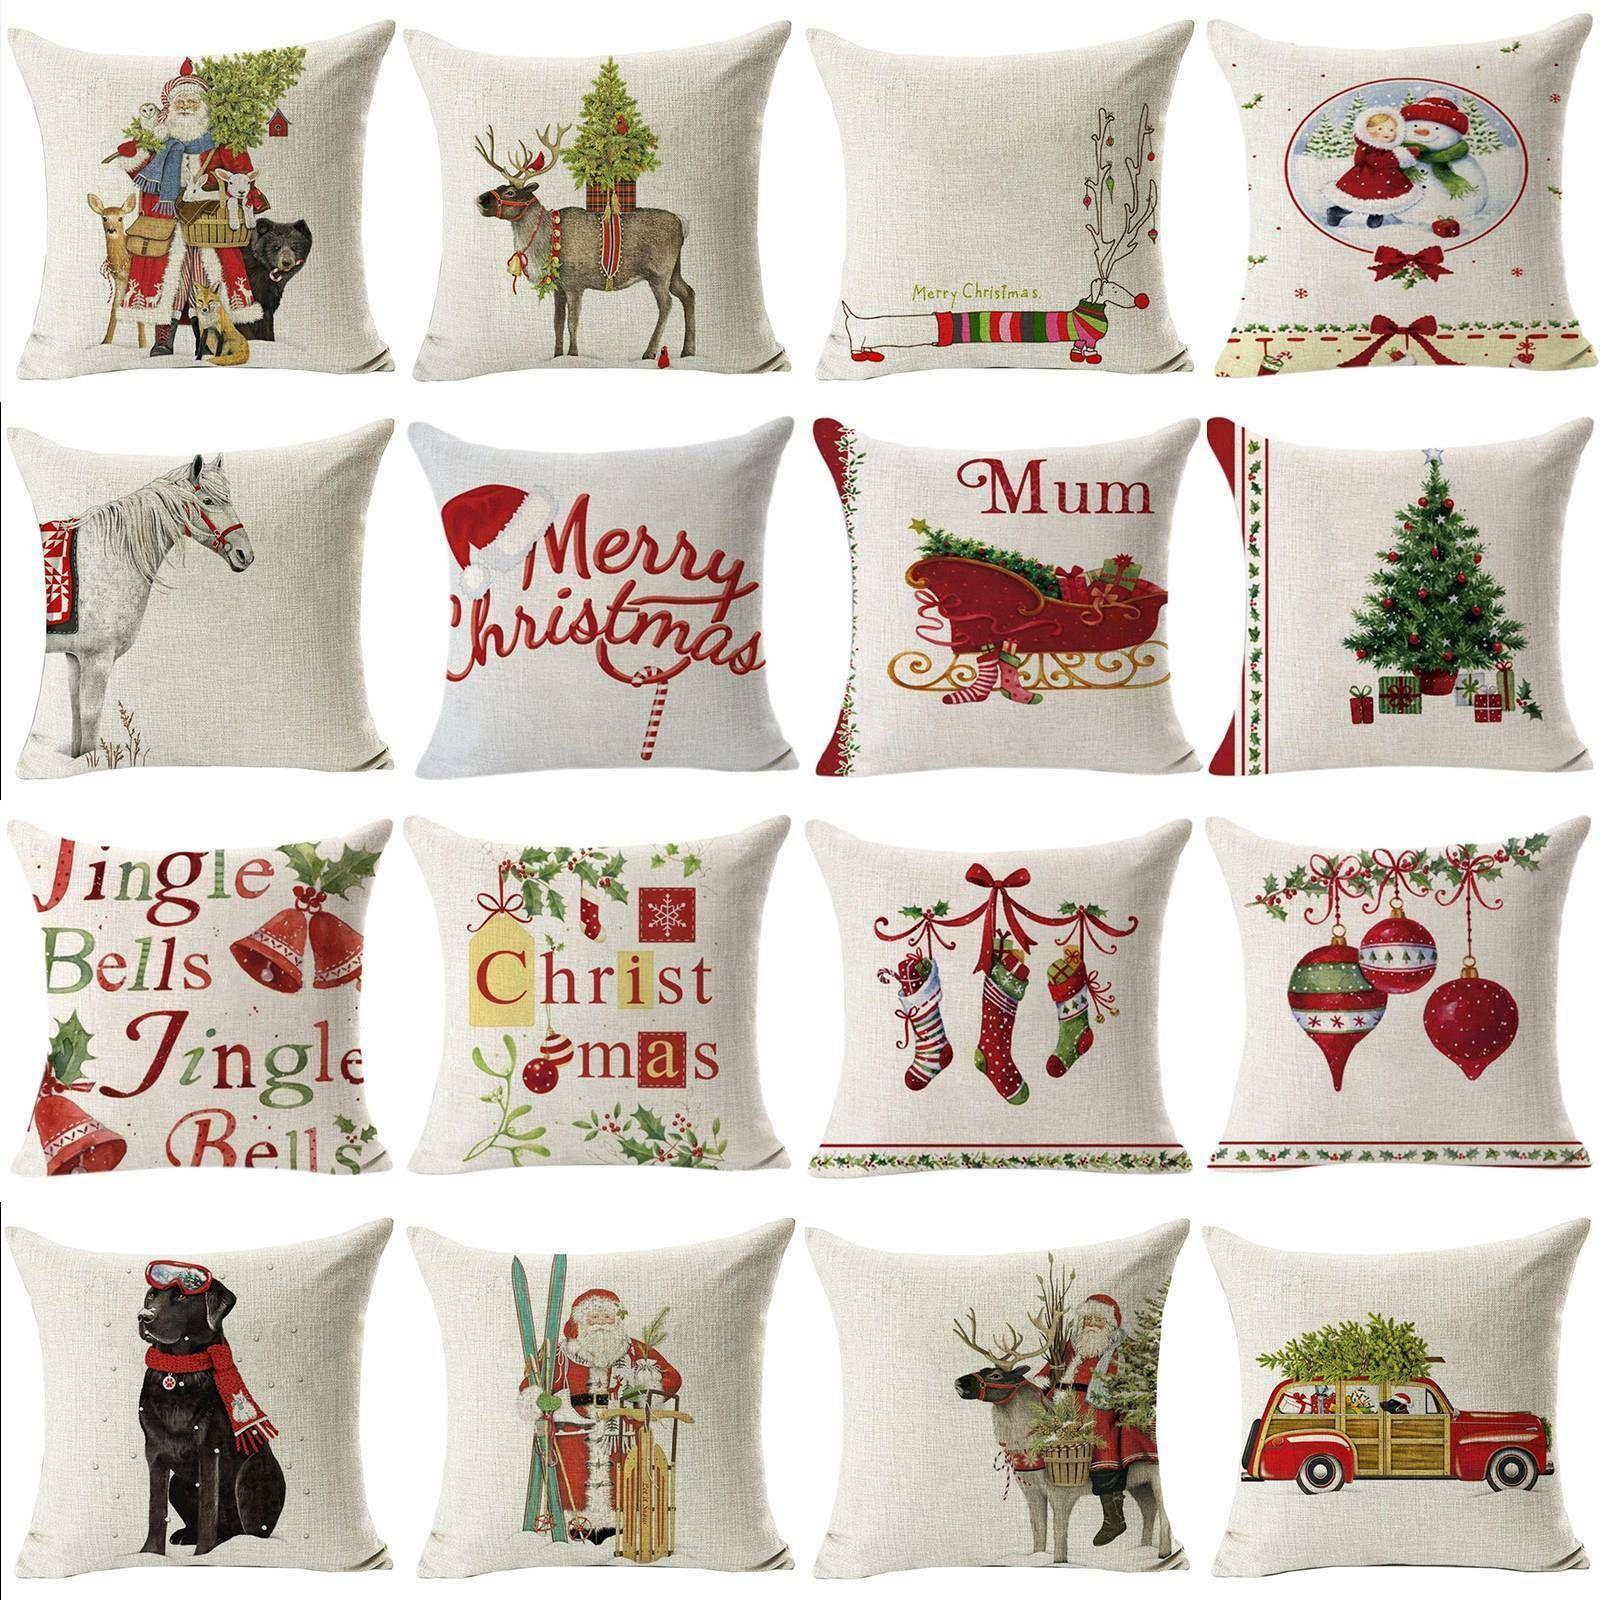 1818 Christmas Pillow Case Sofa Throw Cushion Covers Home Car Decor Xmas Party Sofa Cushions Ideas Of Sofa Cushions With Images Christmas Pillowcases Christmas Pillow